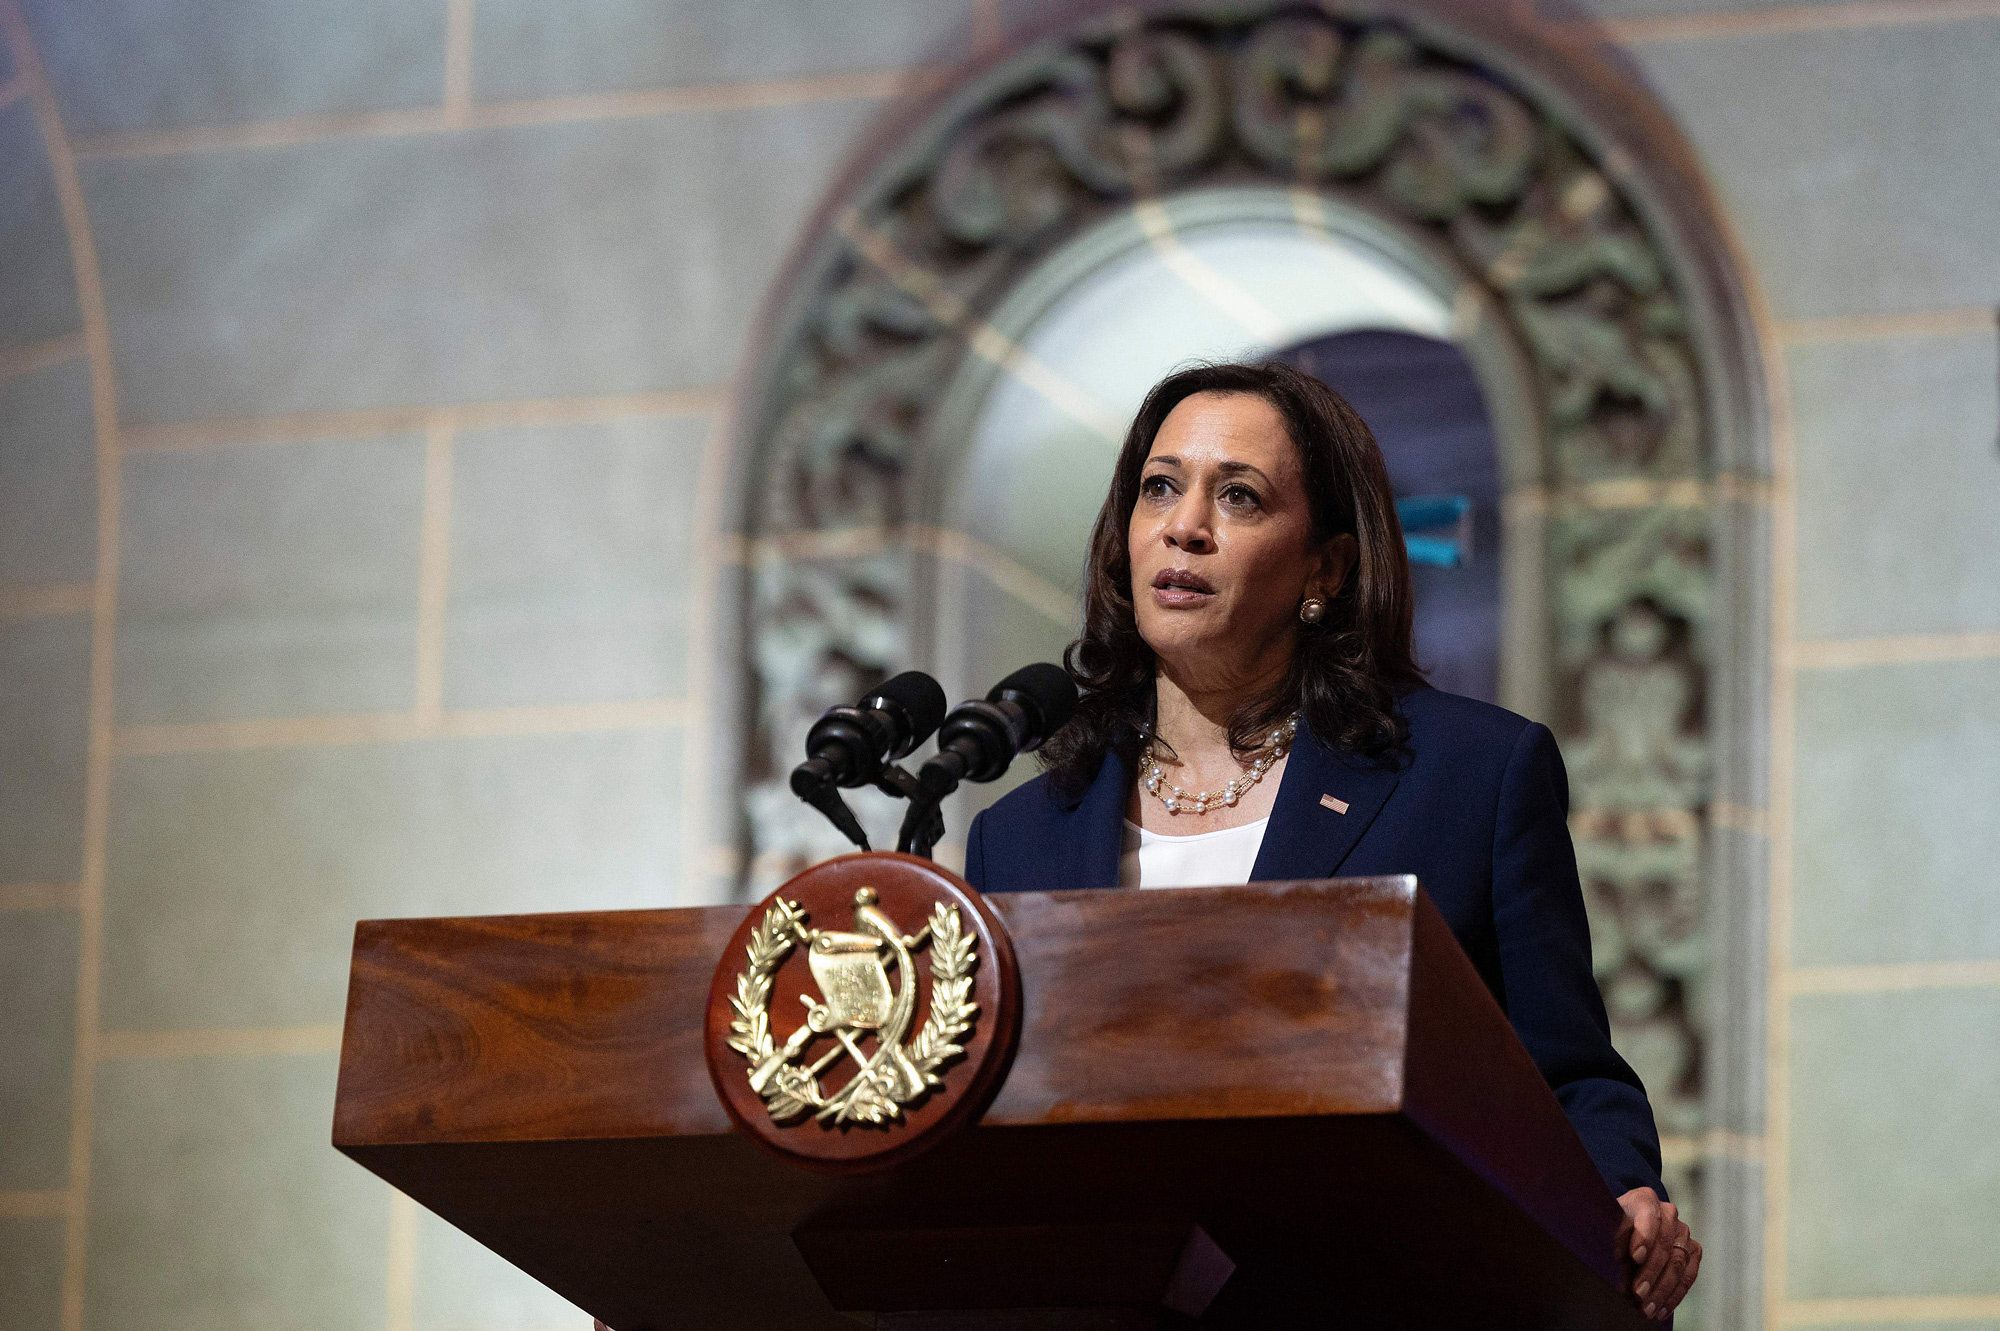 Vice President Kamala Harris speaks during a press conference with Guatemalan President Alejandro Giammattei at the Palacio Nacional de la Cultura in Guatemala City, Guatemala, on June 7.